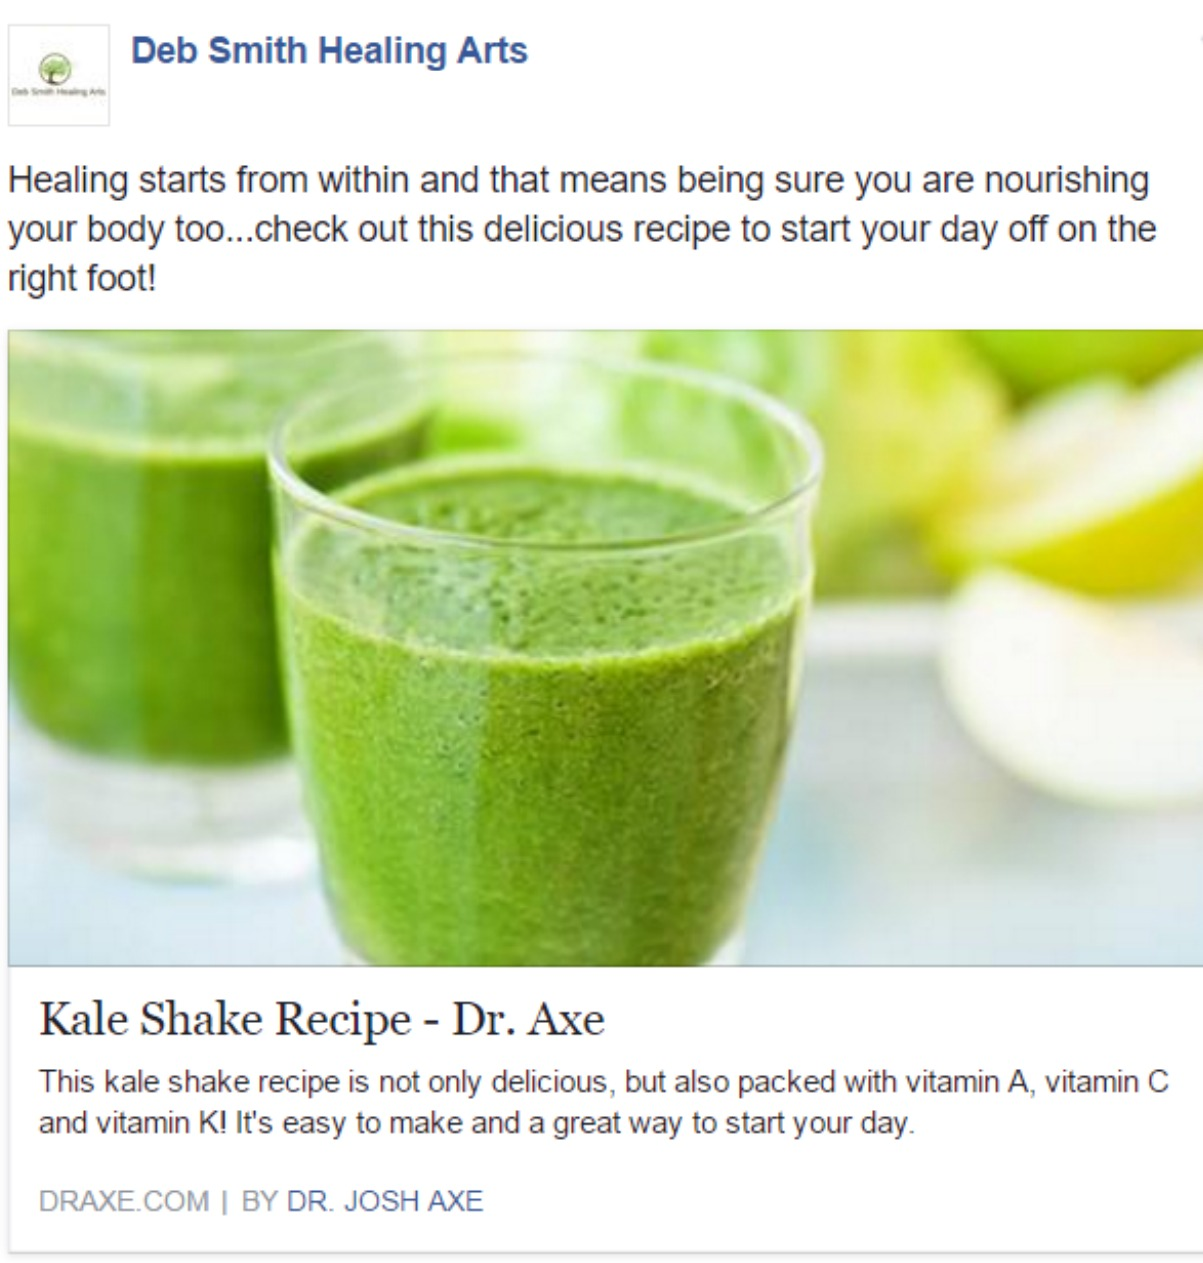 deb smith healing arts social media sample